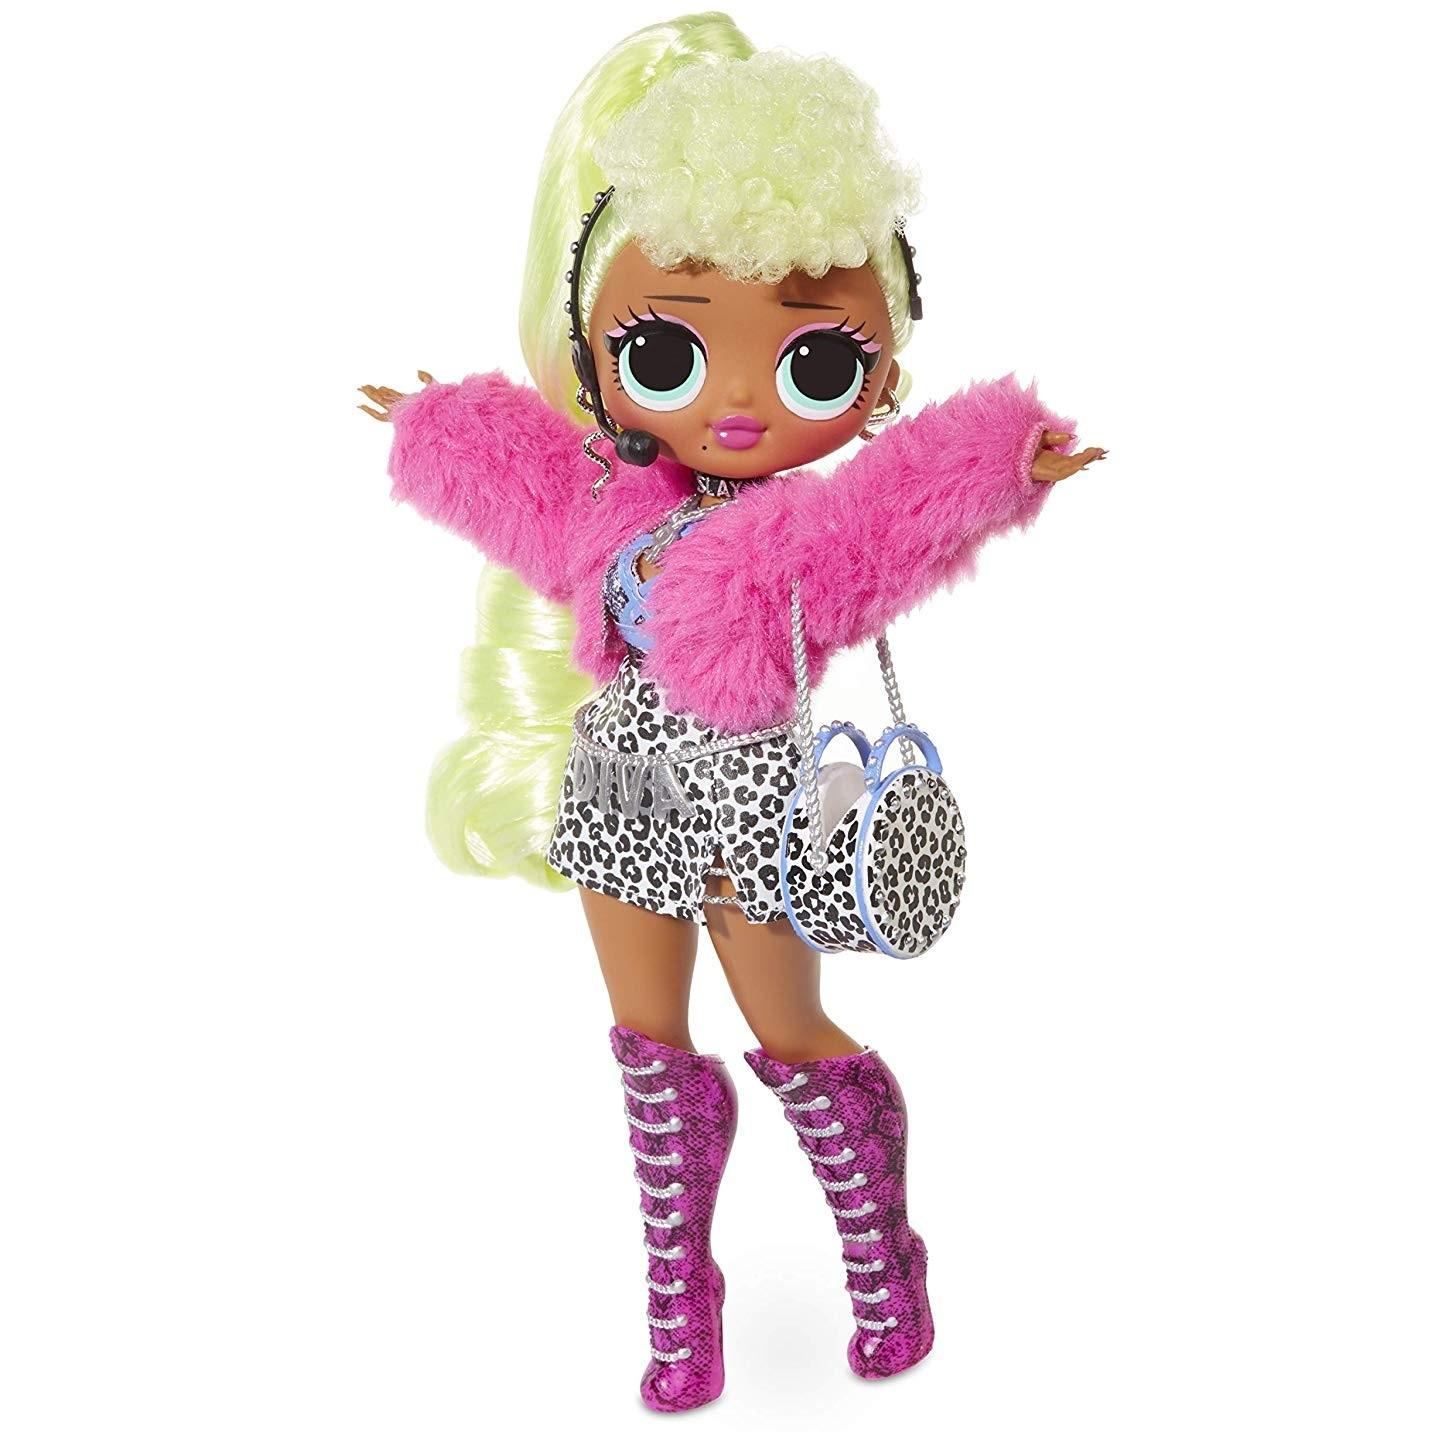 Большая Кукла ЛОЛ ОМГ Дива (Lady Diva) - O.M.G. LOL ...